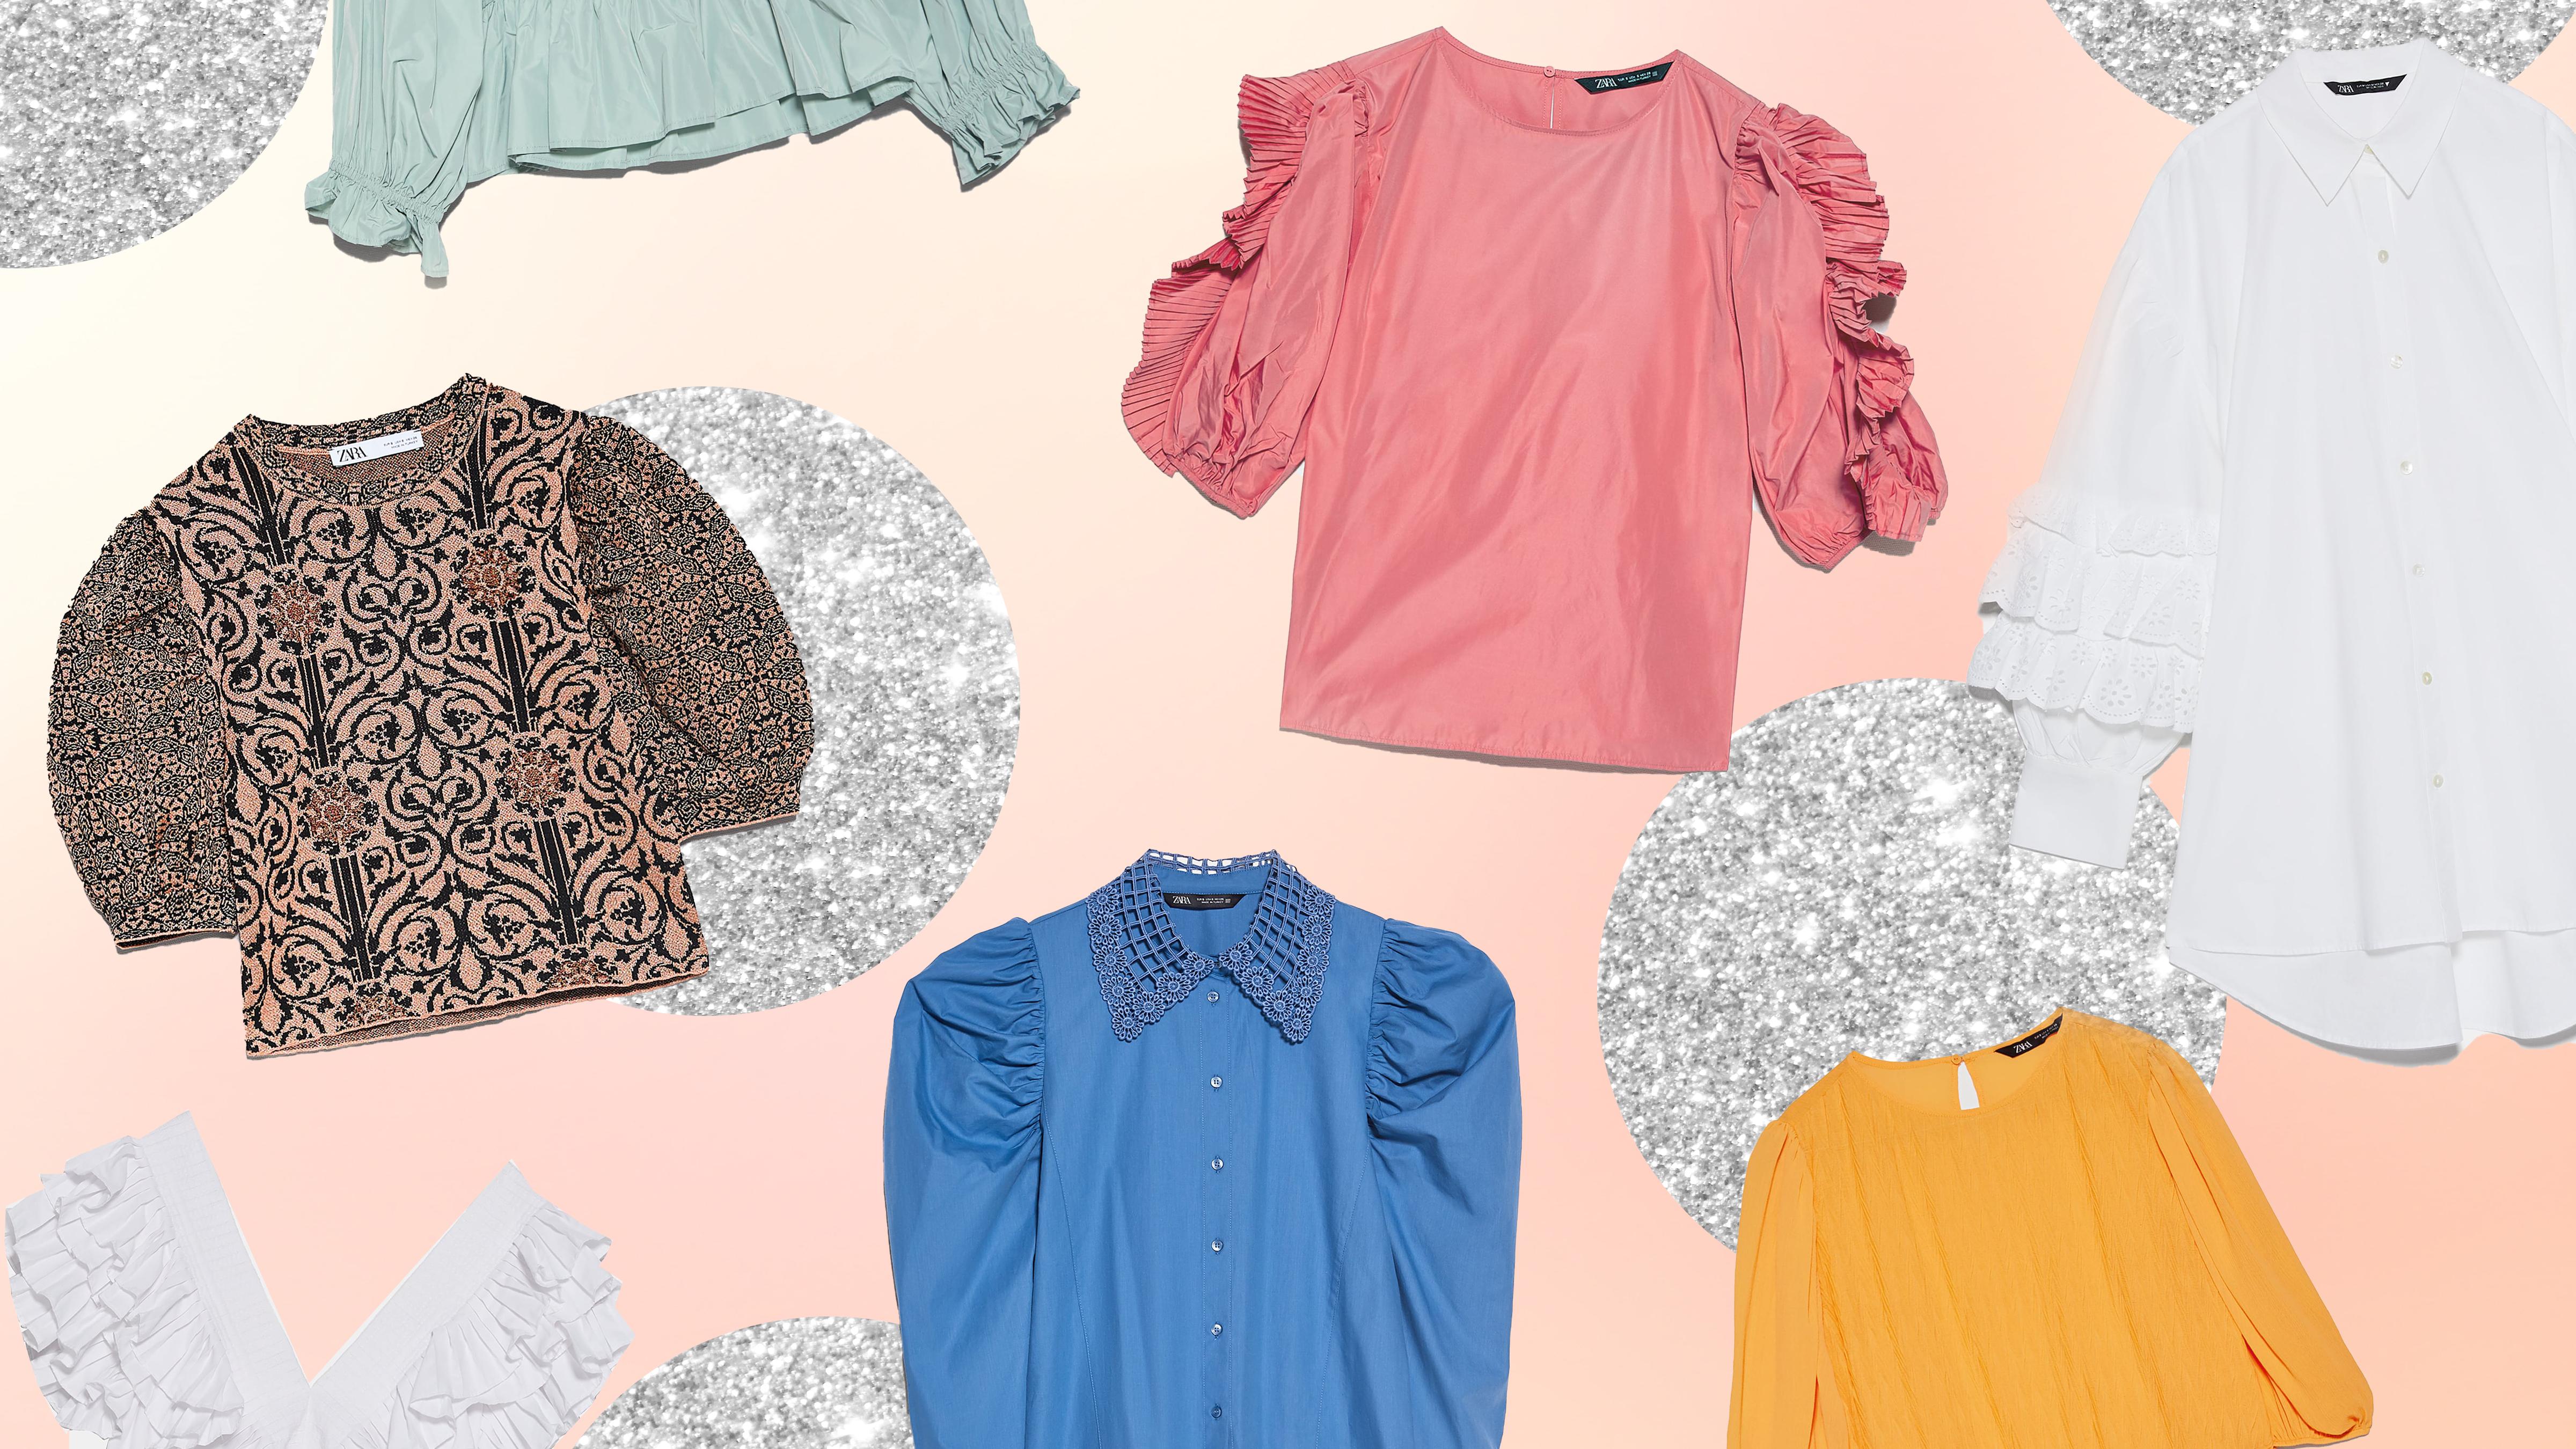 21 Zara Tops That Nail This Season's Statement Sleeve Trend